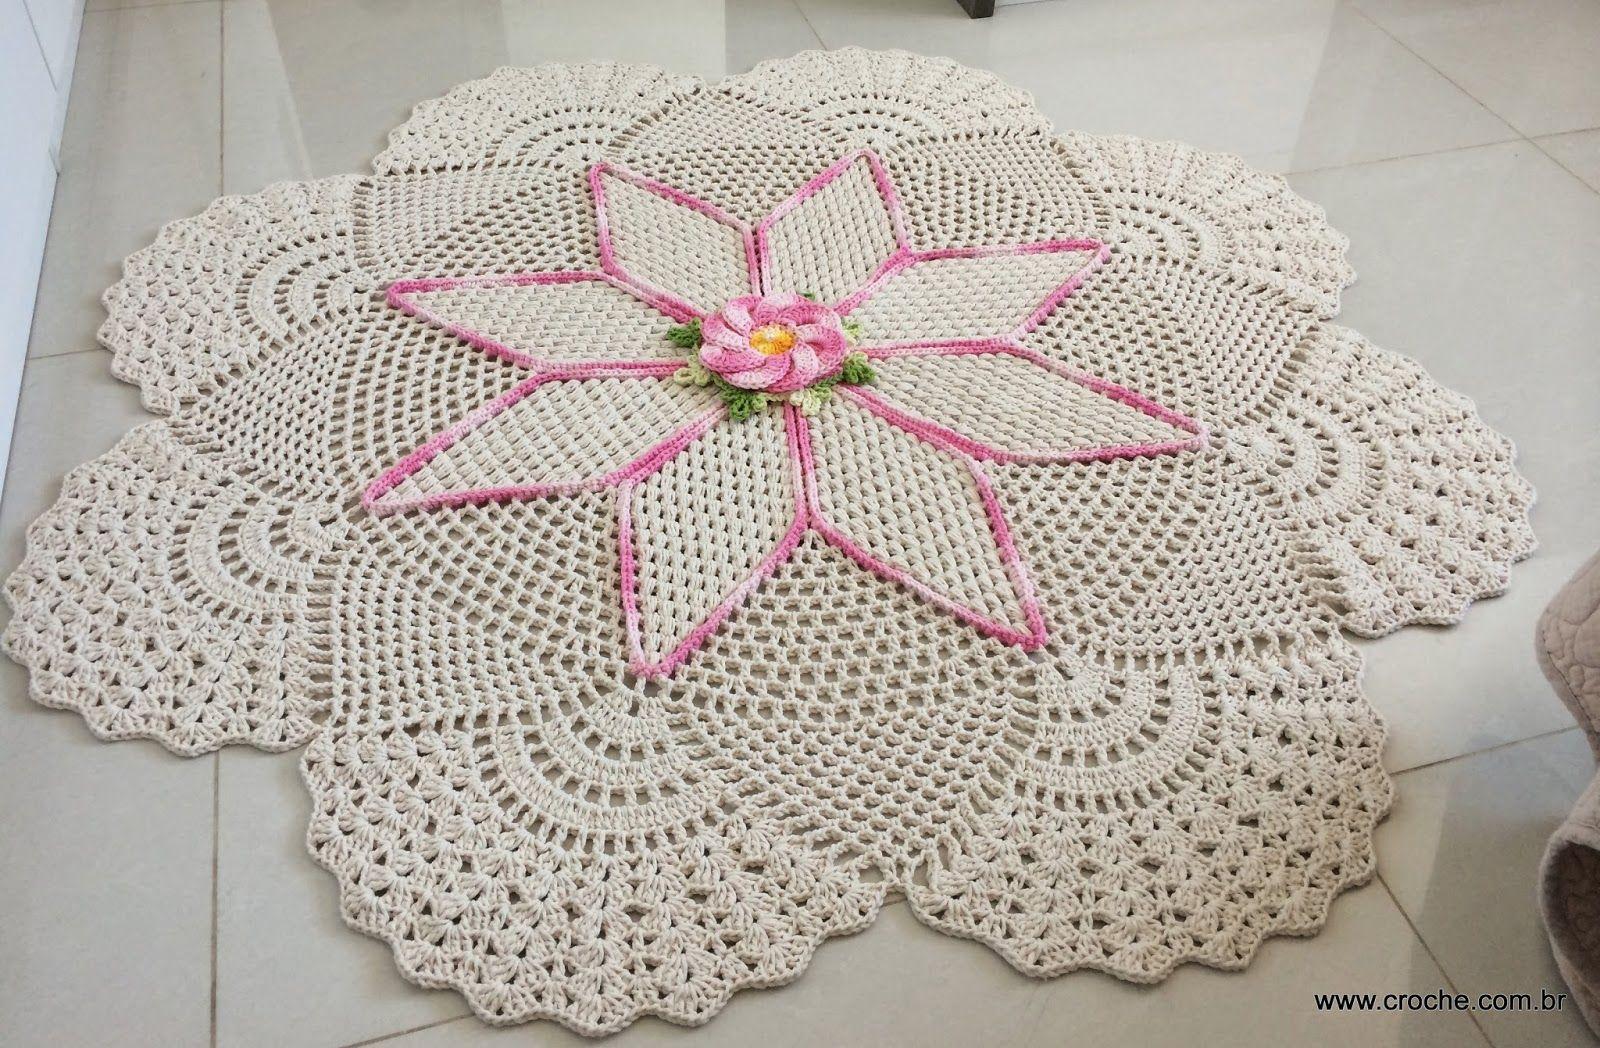 Meus Trabalhos Croch Pinterest -> Tapete De Croche Redondo Passo A Passo